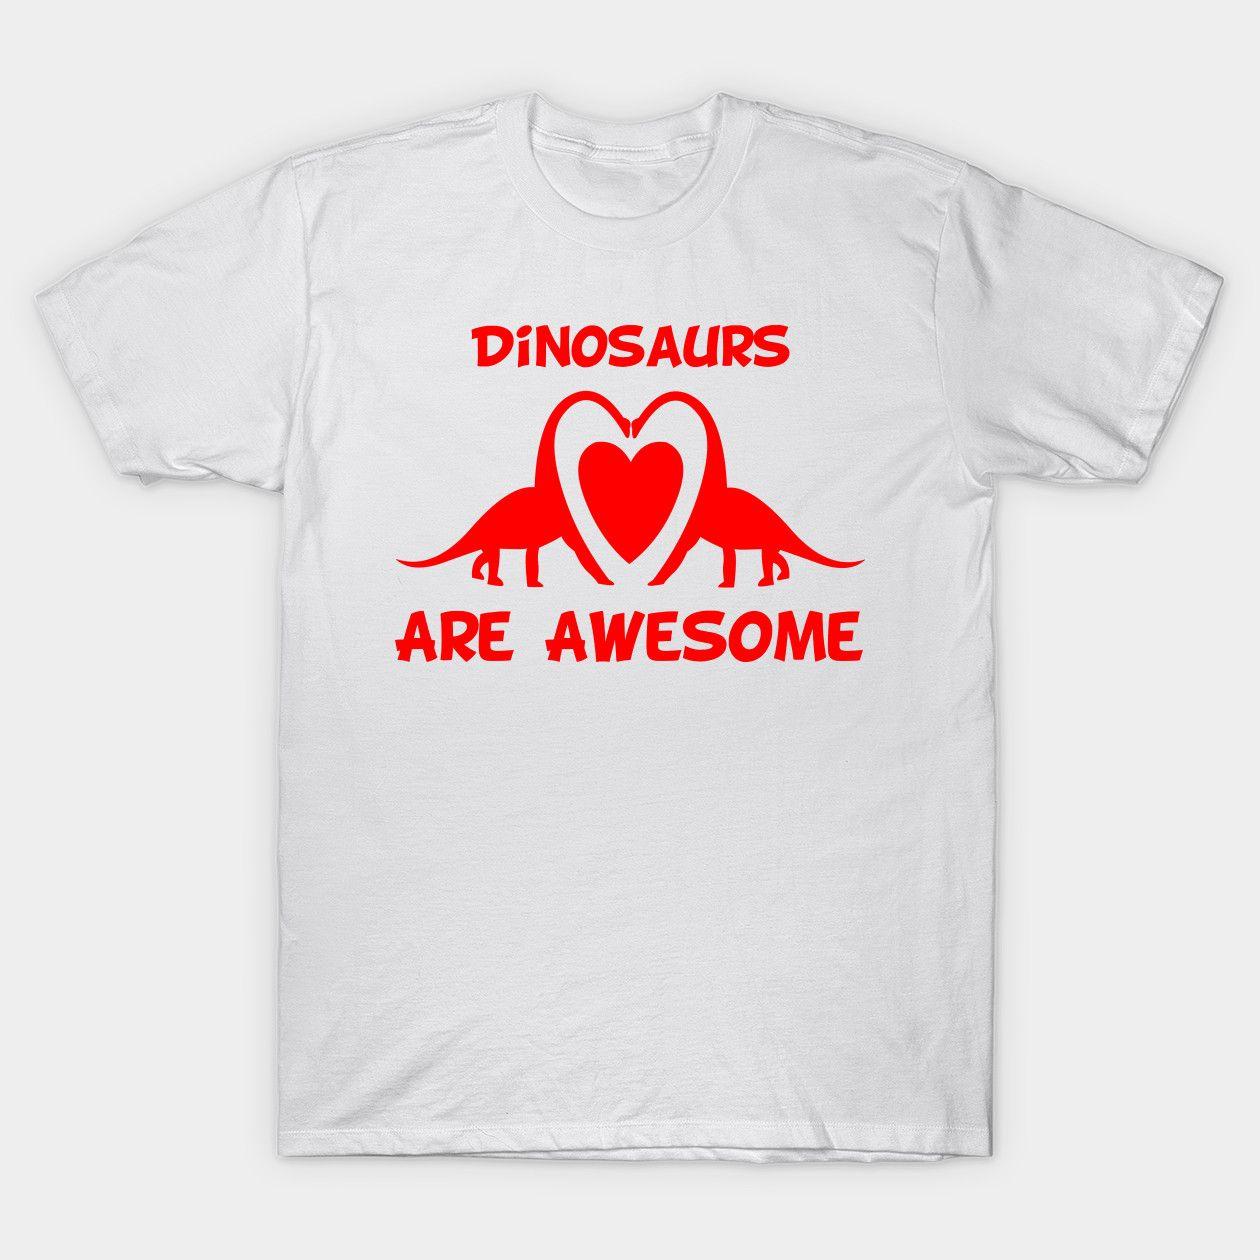 Dinosaur, Dinosaur lover, T rex, prehistoric, Dino, Prehistoric creature, Tyrannosaurus Rex, Trex, tyrannosaur, Animal, Dinosaur lover, t rex, dinosa #prehistoriccreatures